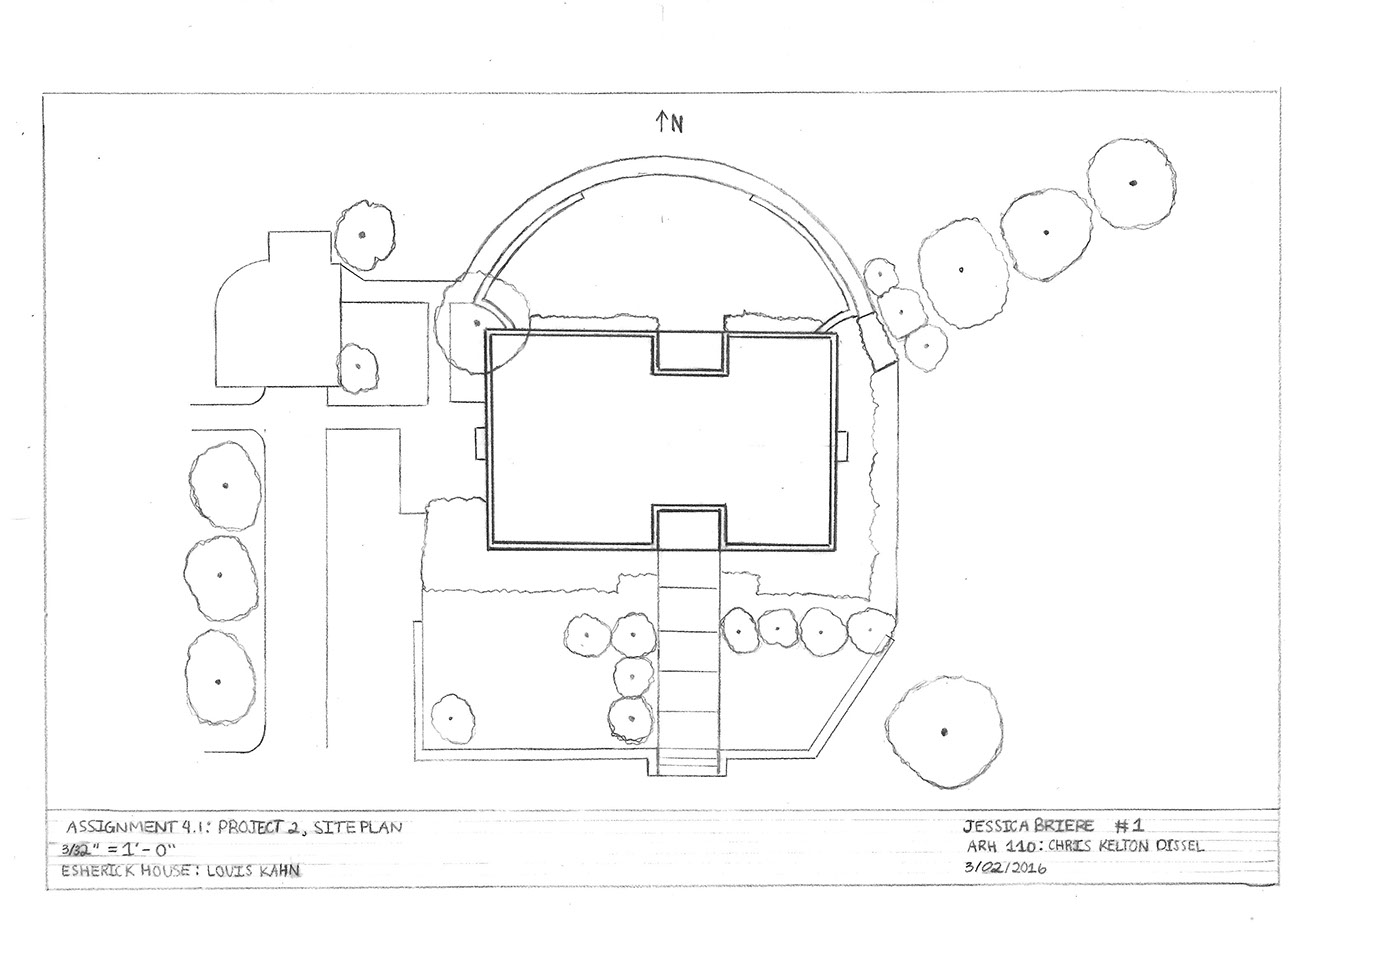 How To Read Dimensions On A Floor Plan Case Study Esherick House Louis Kahn On Behance